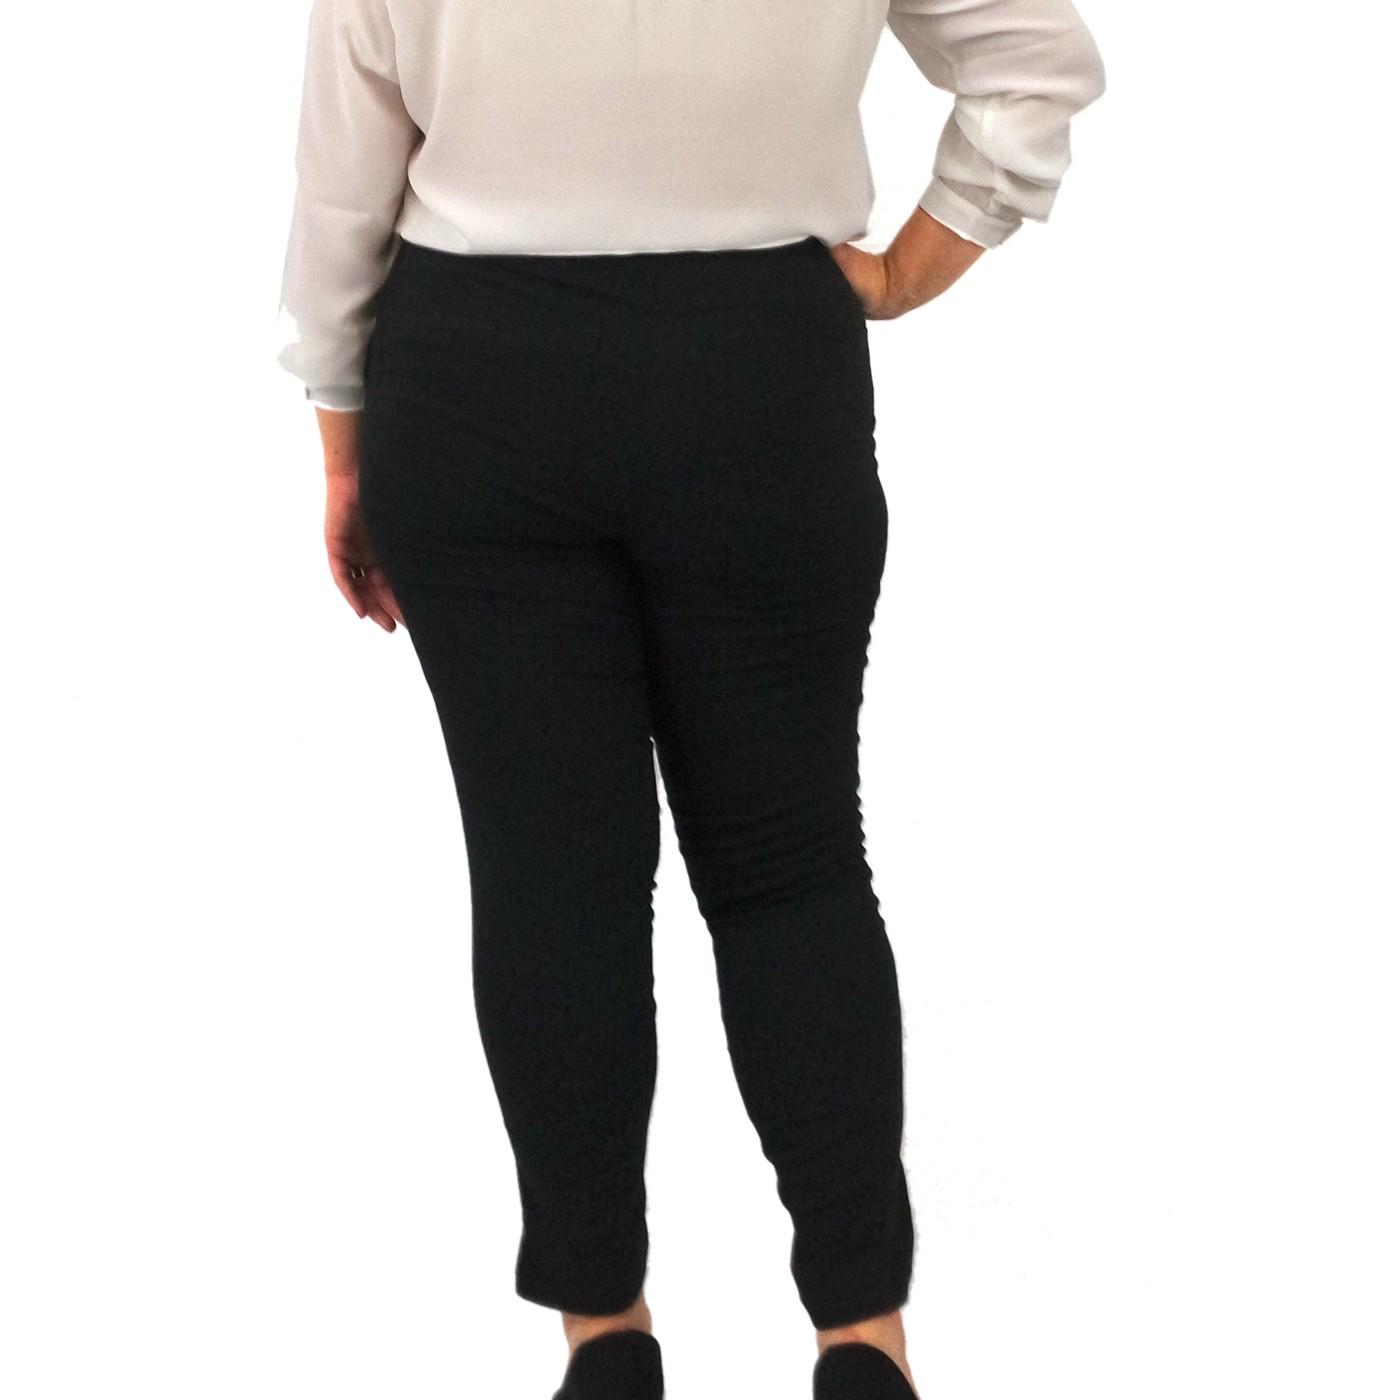 Calça Skinny Cigarrete Plus Size Preta Poliéster